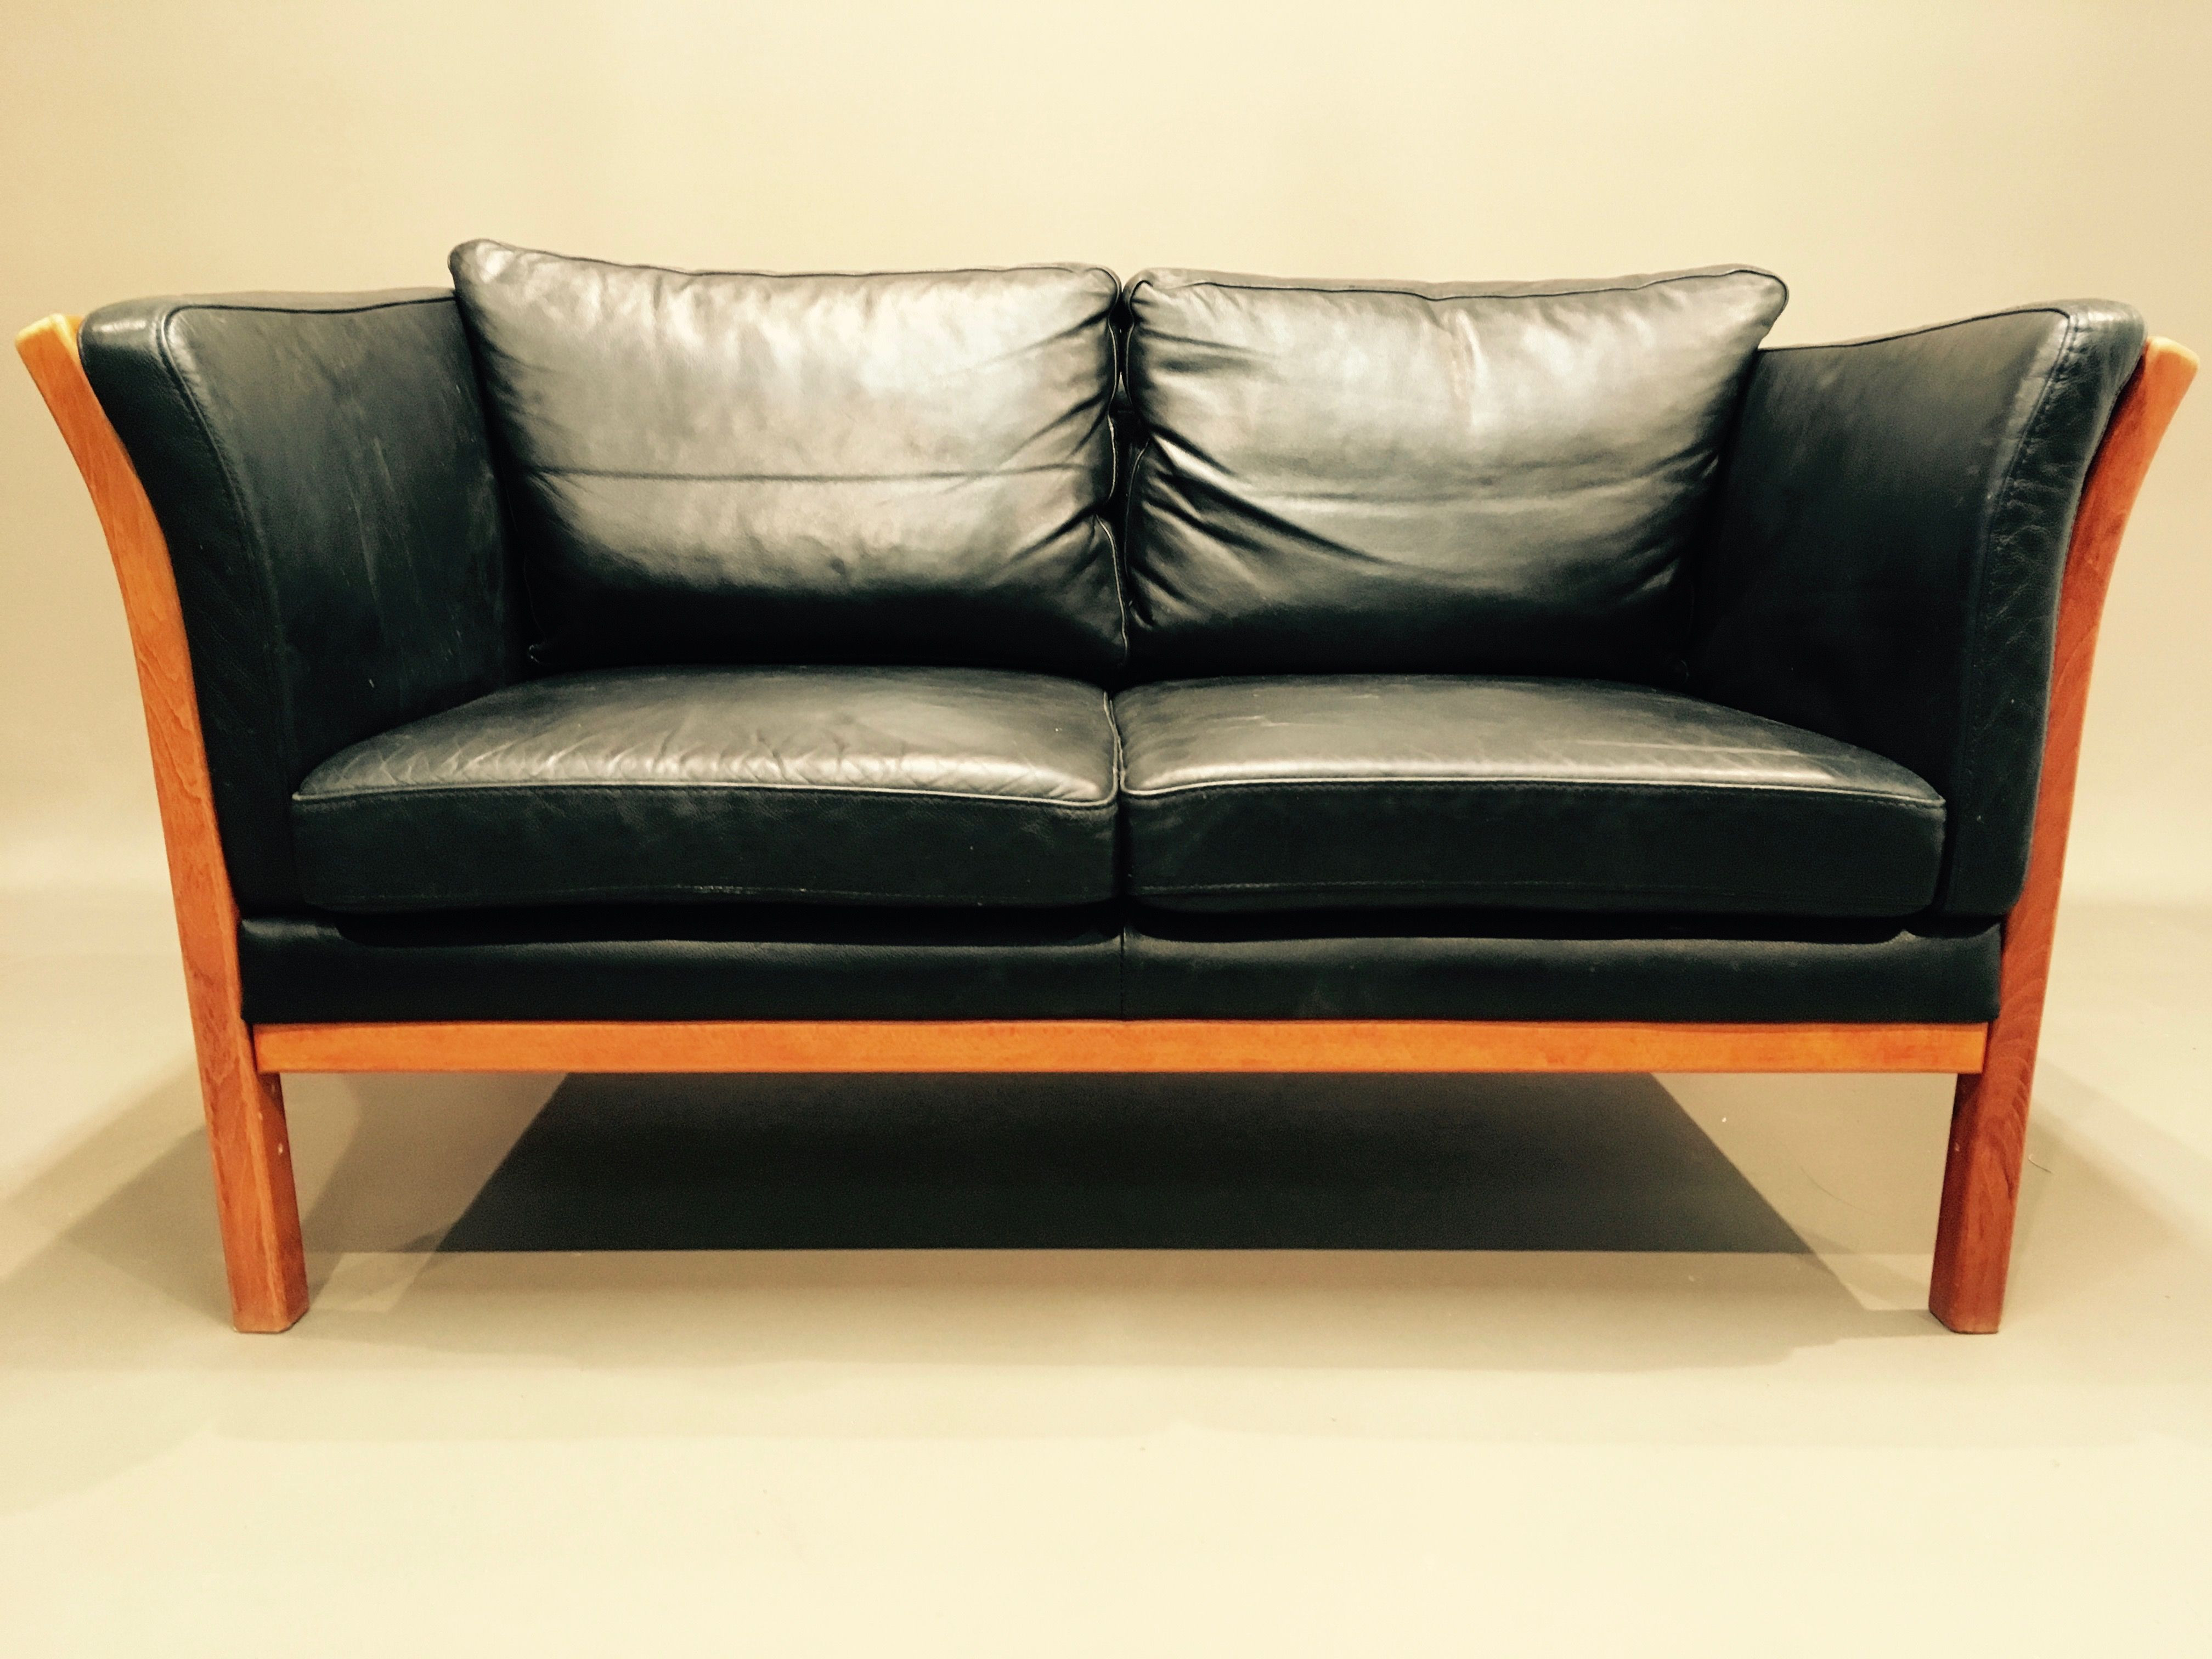 Vintage Scandinavian 2 Seater Sofa In Black Leather